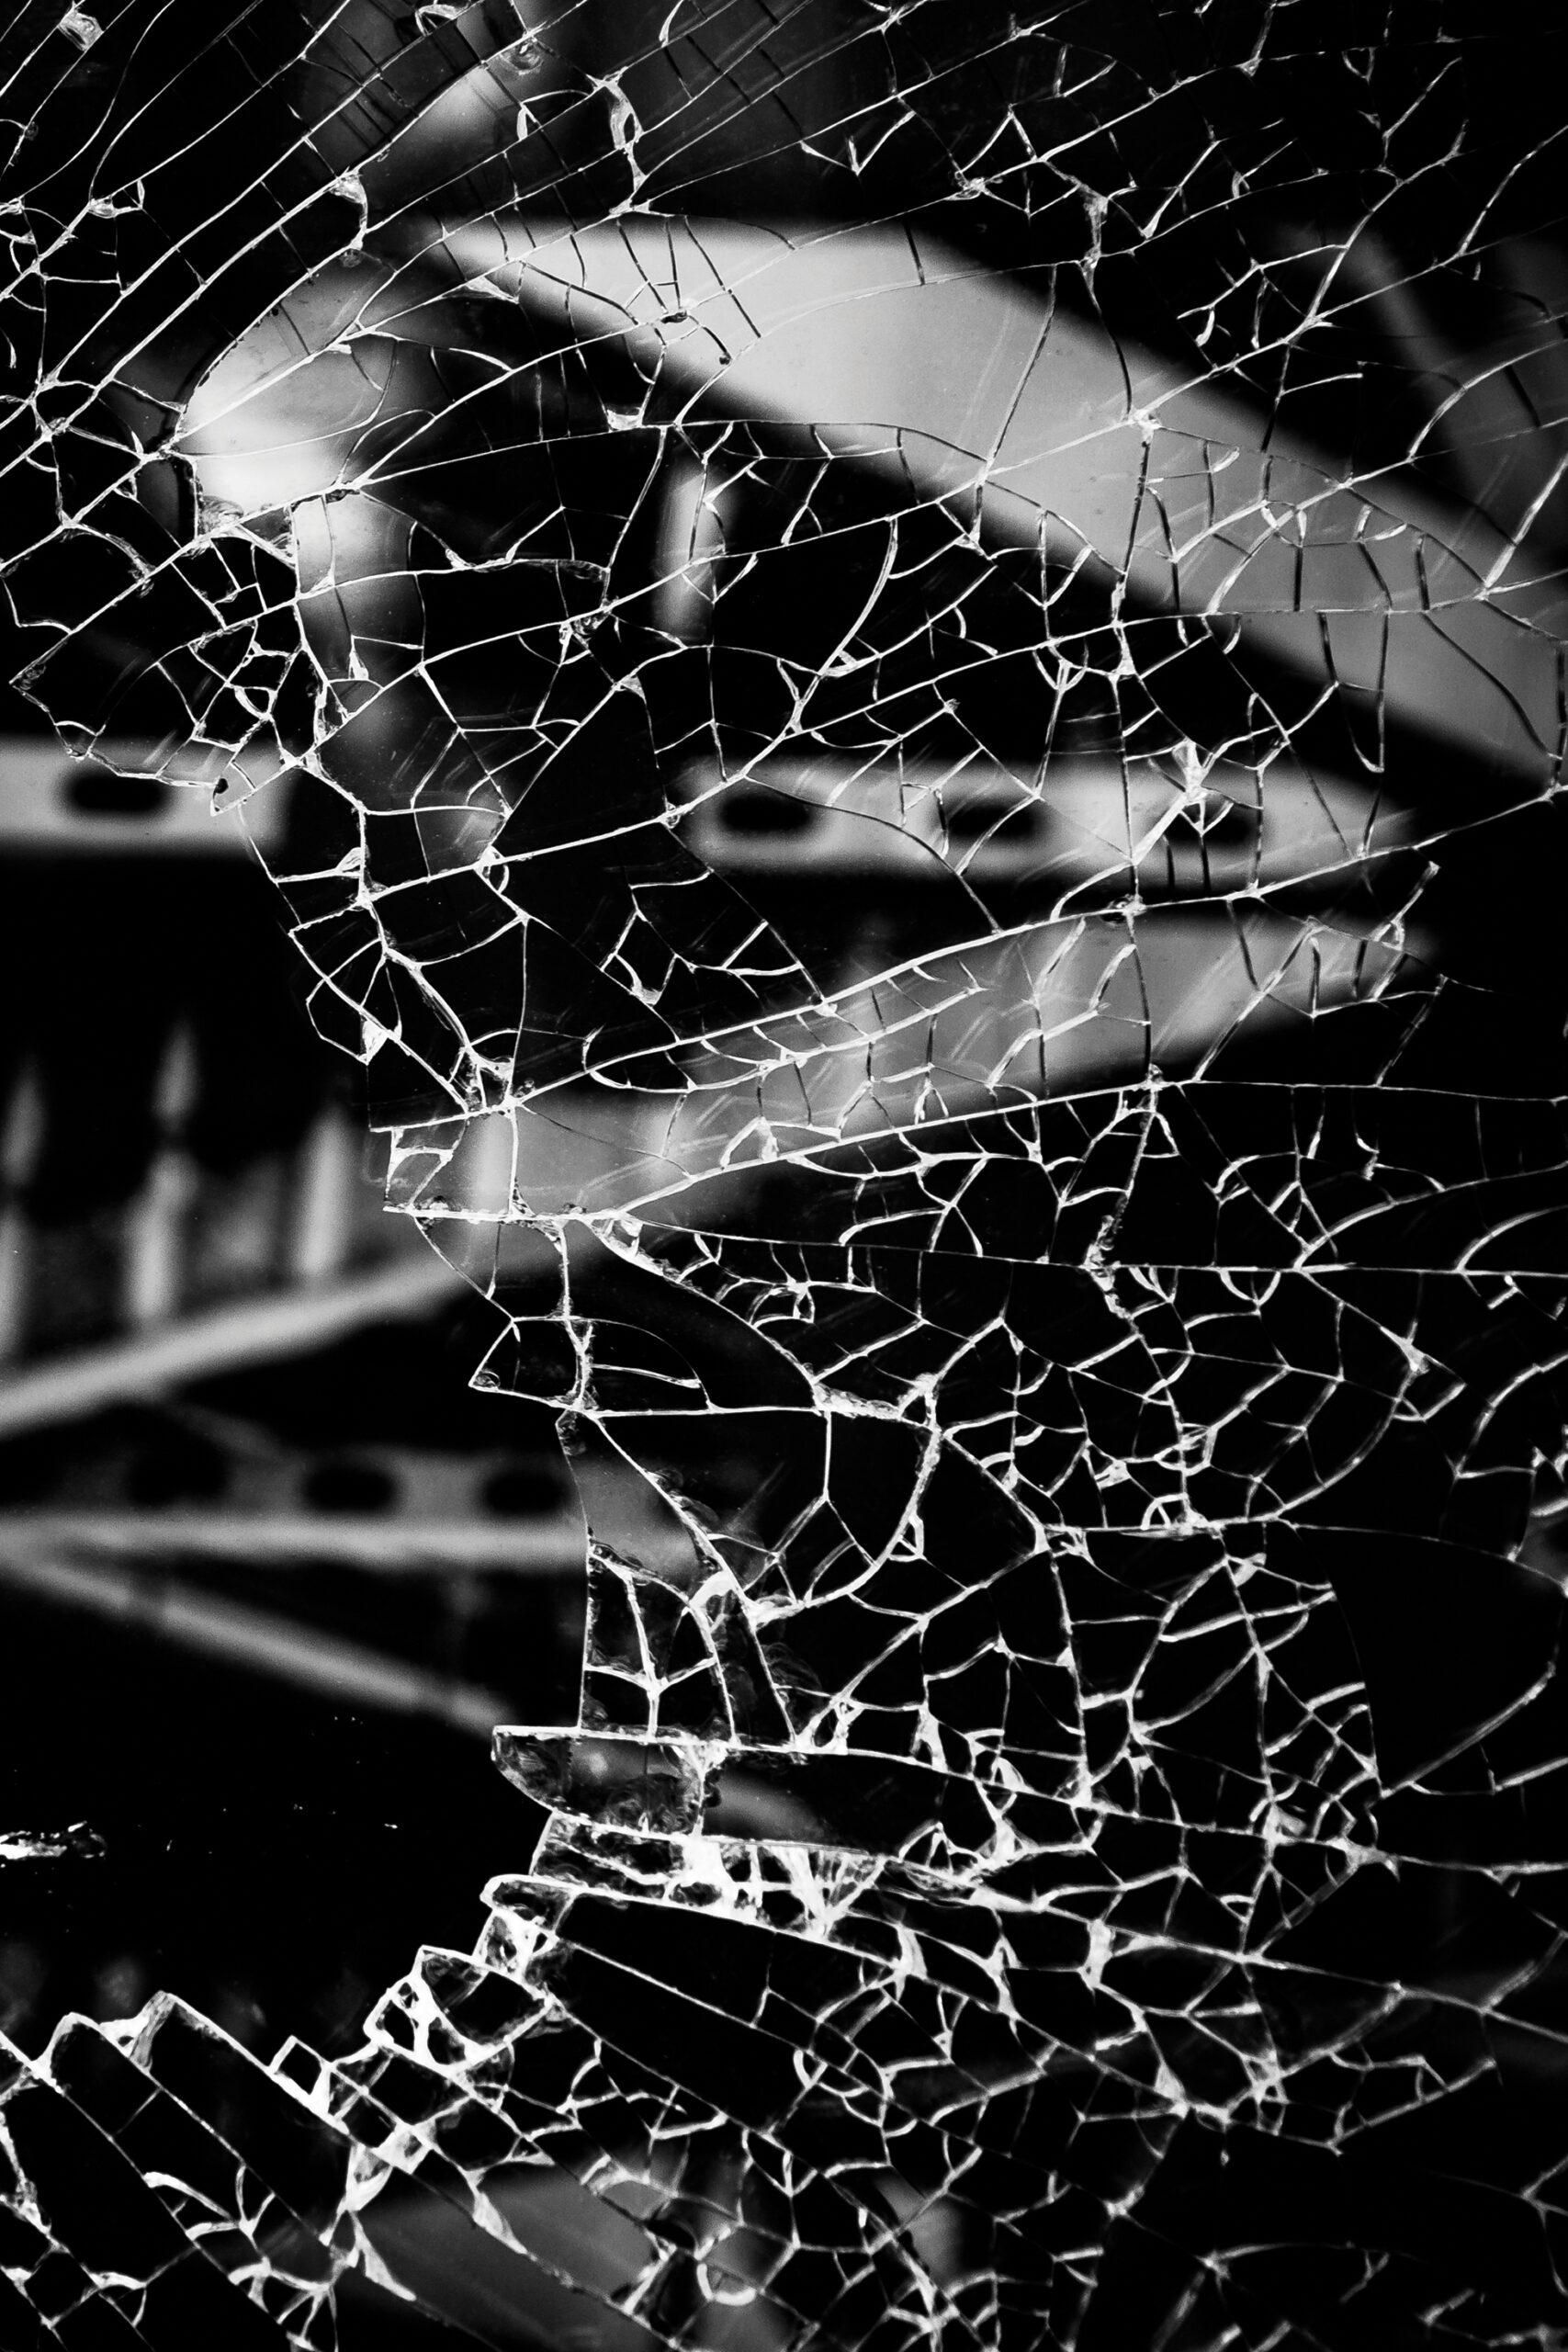 broken edges of glass